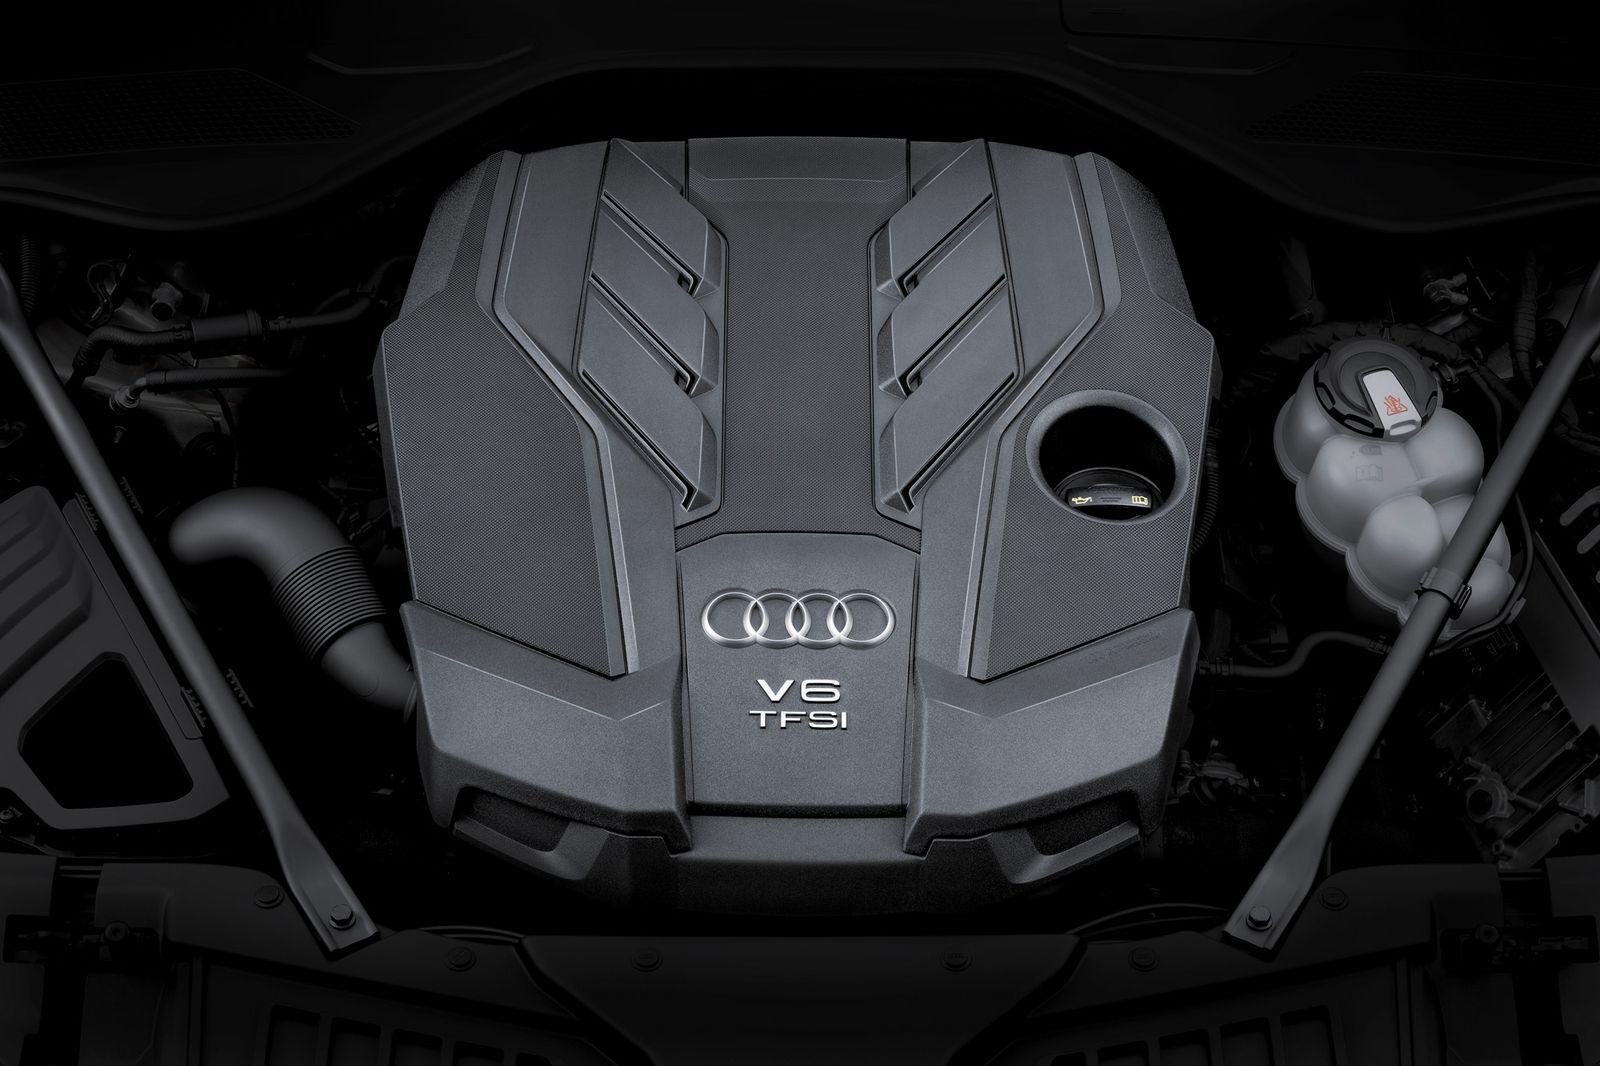 SPERRFRIST 11. 07.17 10.30 UHR / Audi A8